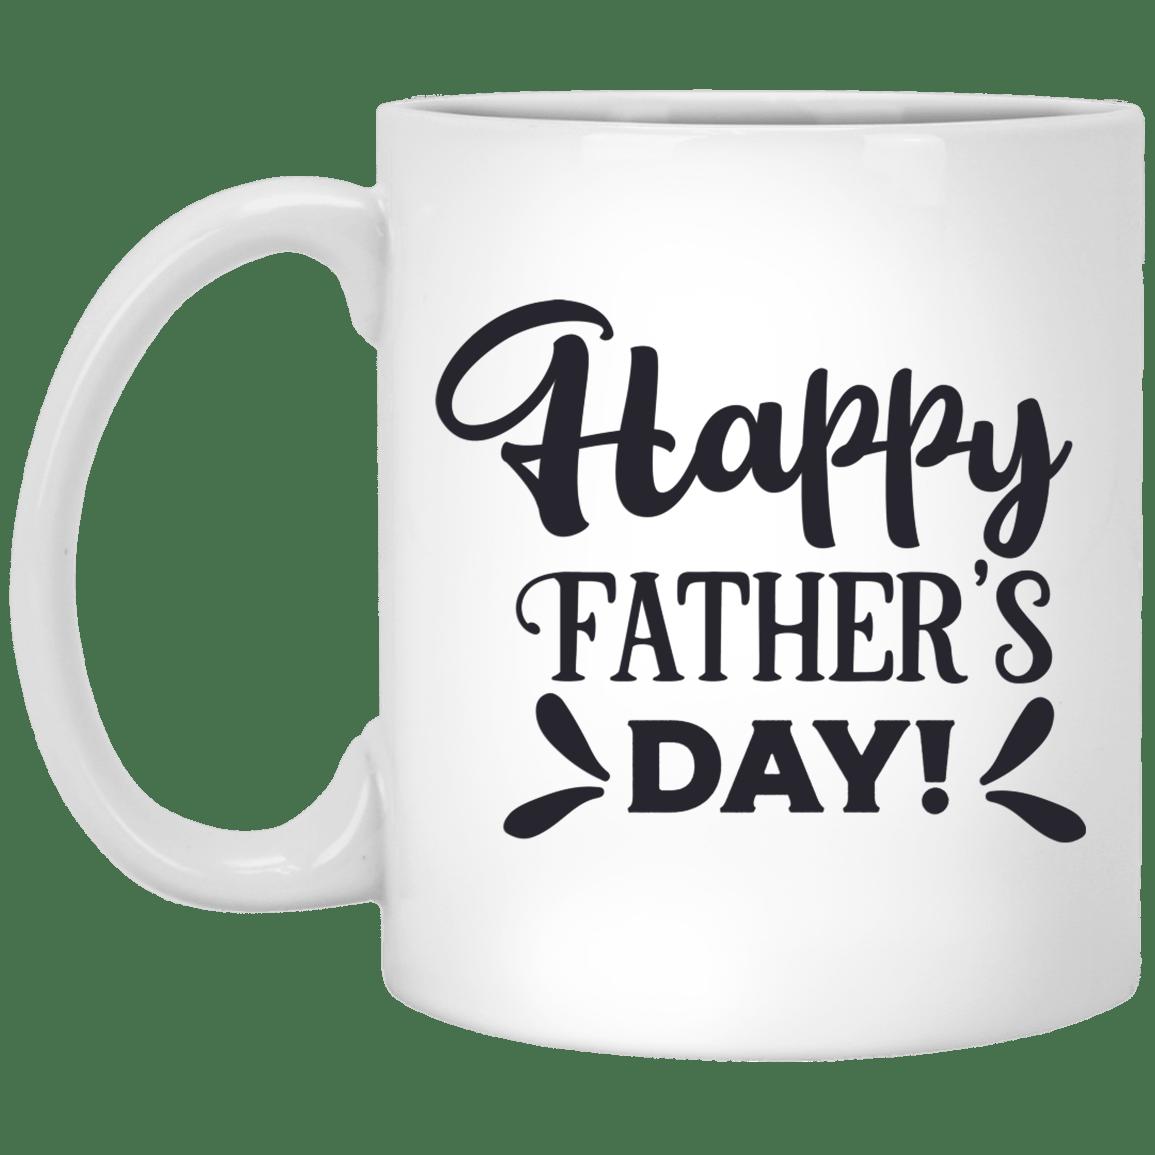 Happy Father's Day White Mug 11 oz.